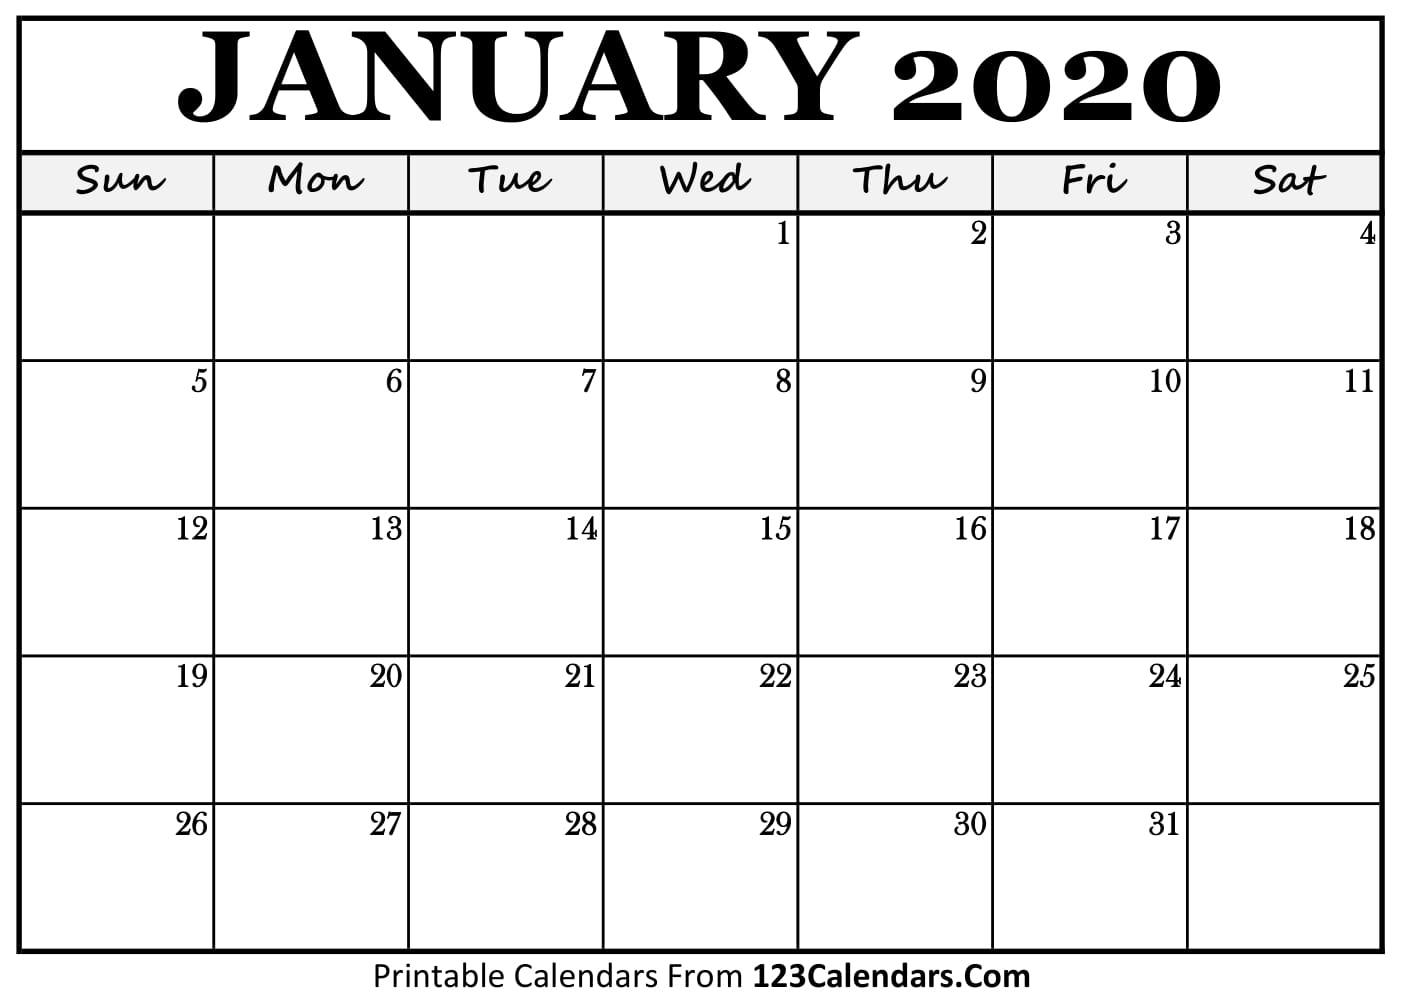 Free Online Printable Calendar 2020 - Wpa.wpart.co